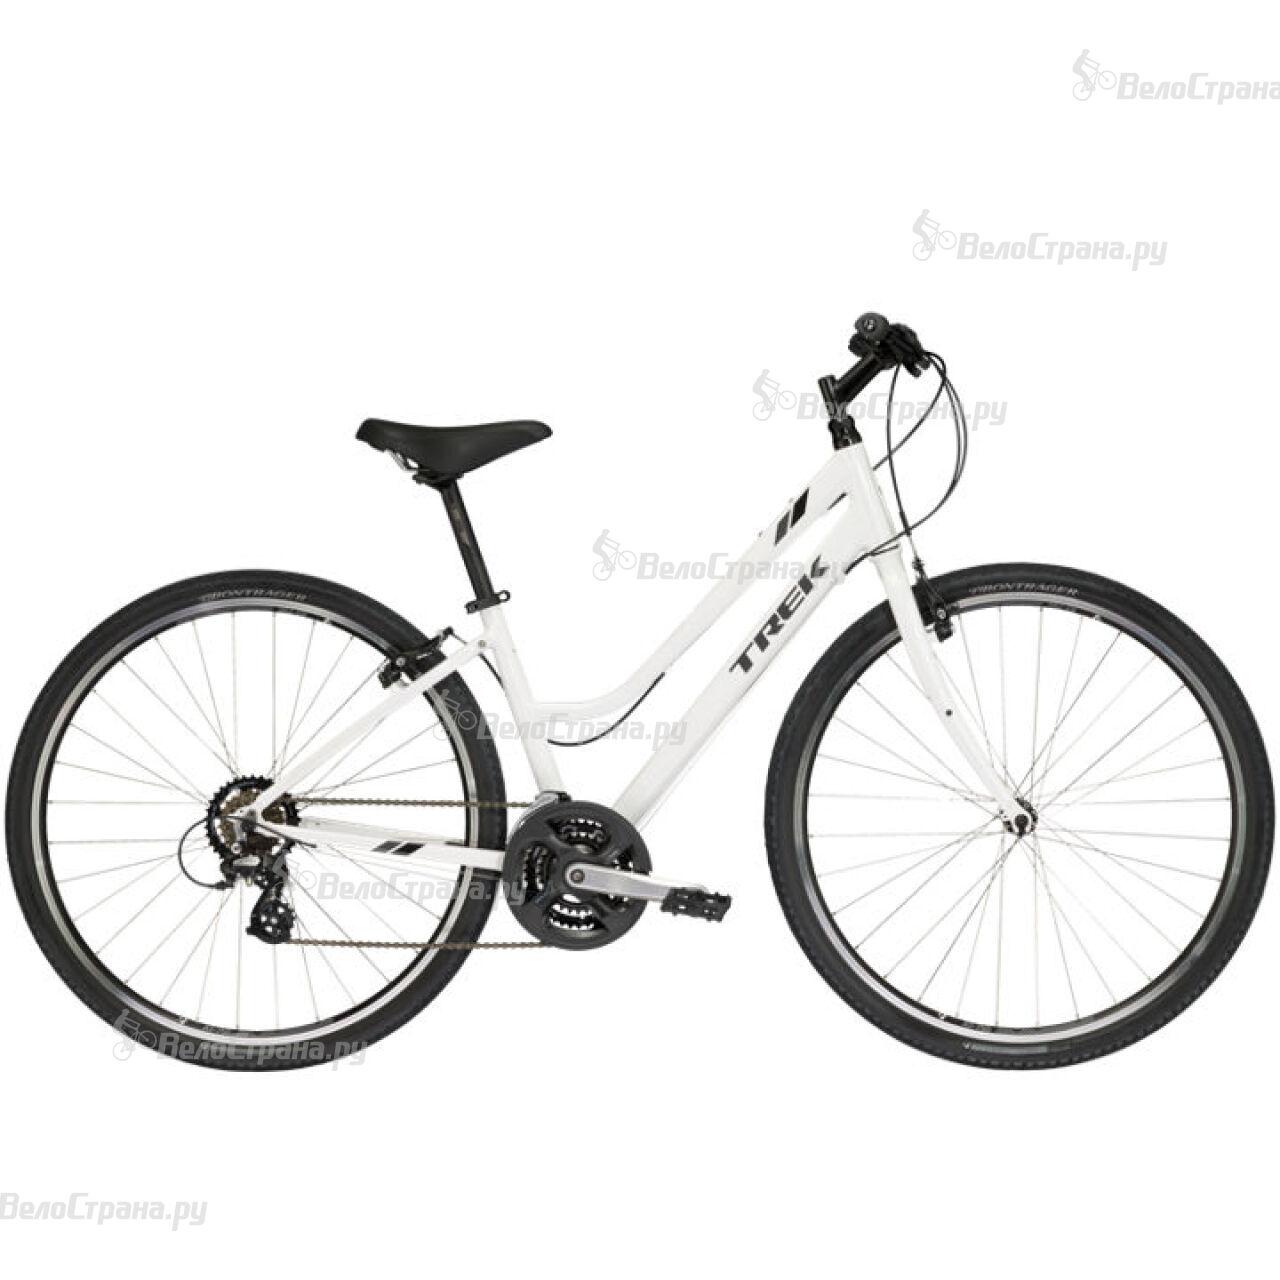 Велосипед Trek Verve 1 WSD (2017) велосипед trek madone 3 1 wsd 2013